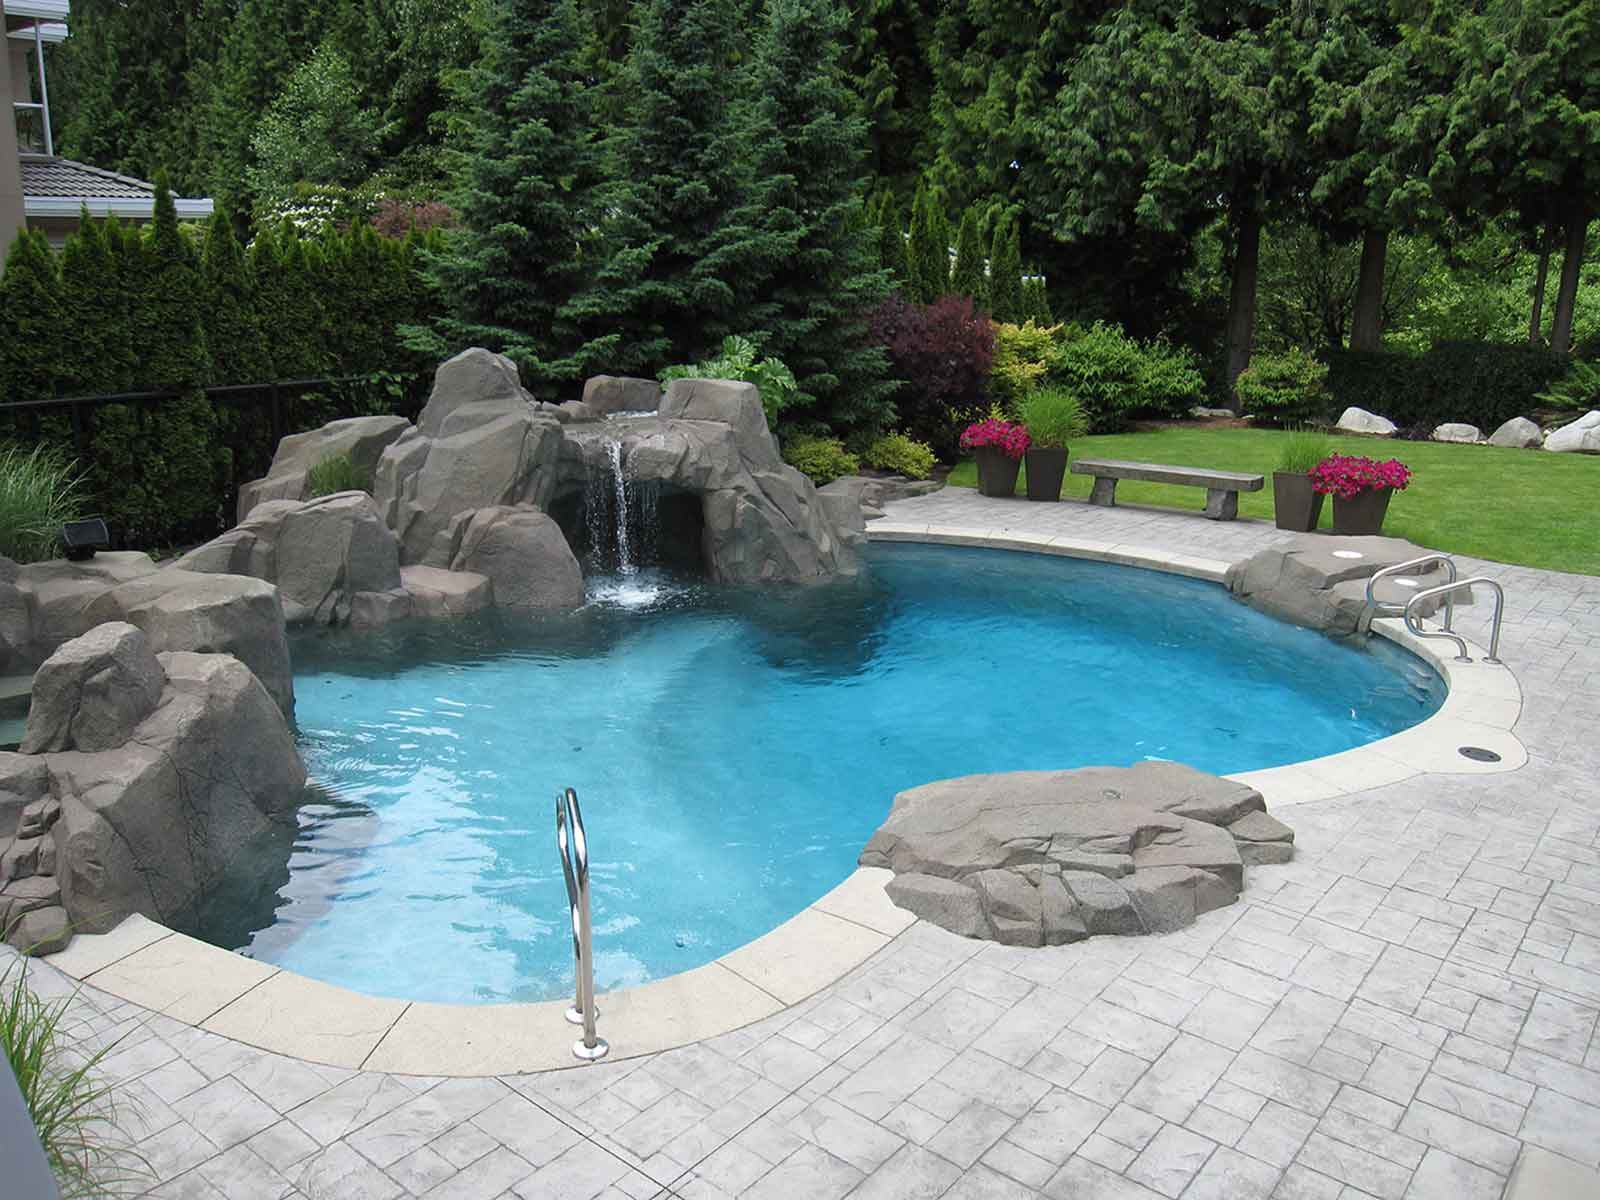 Concrete paved swimming pool deck